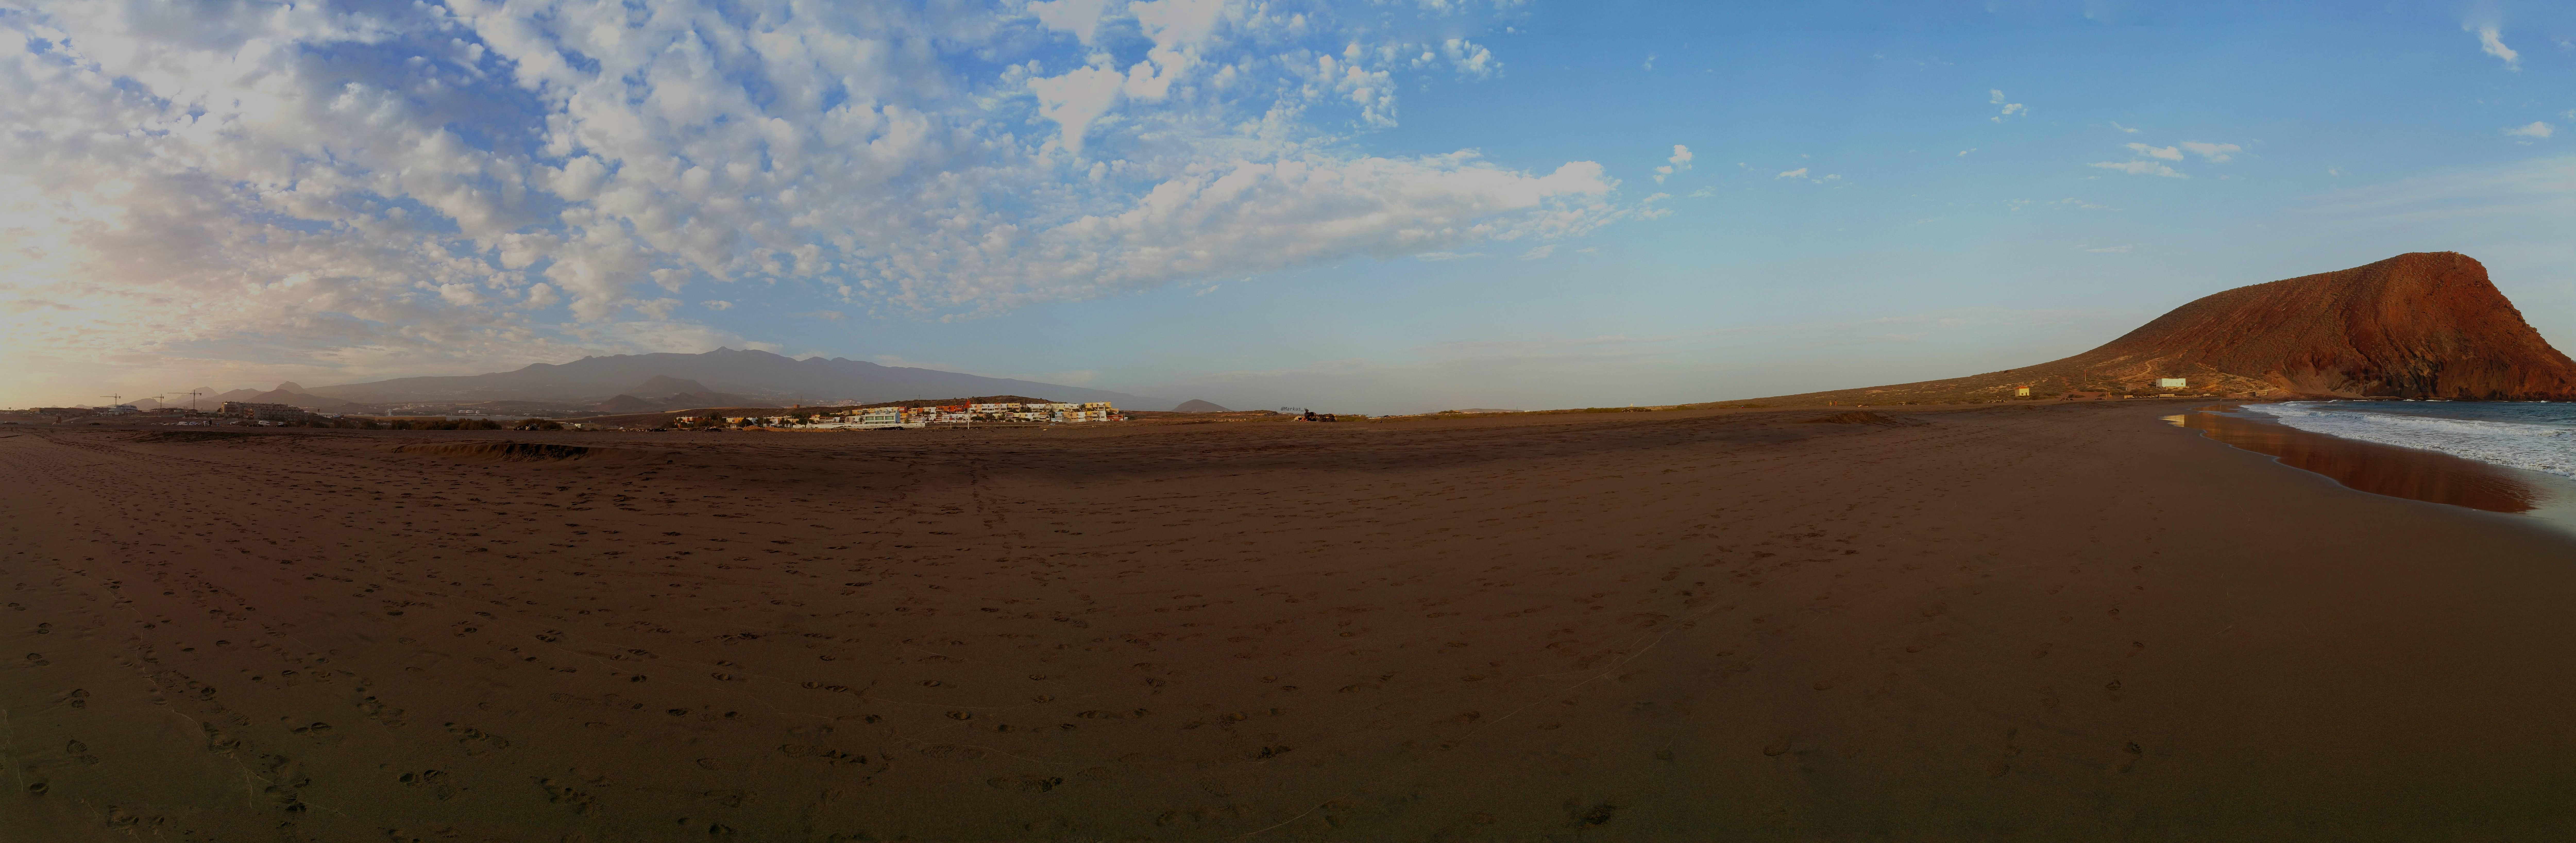 ITAP of a beach near tenerife south airport. [12985x4247] http://ift.tt/2kWU39d